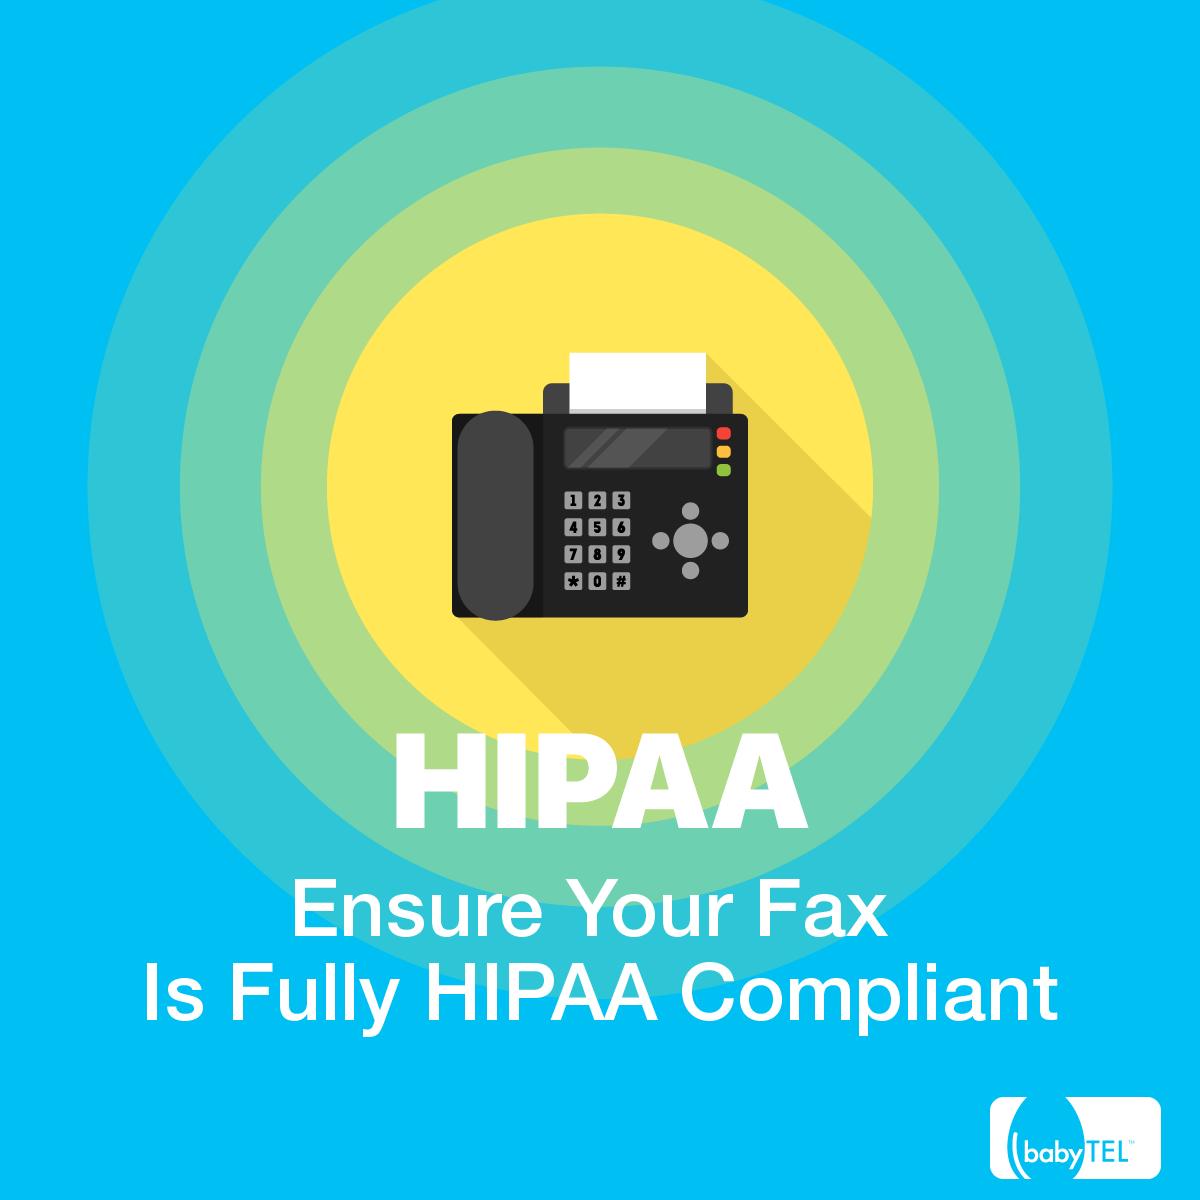 HIPAA Compliant Fax